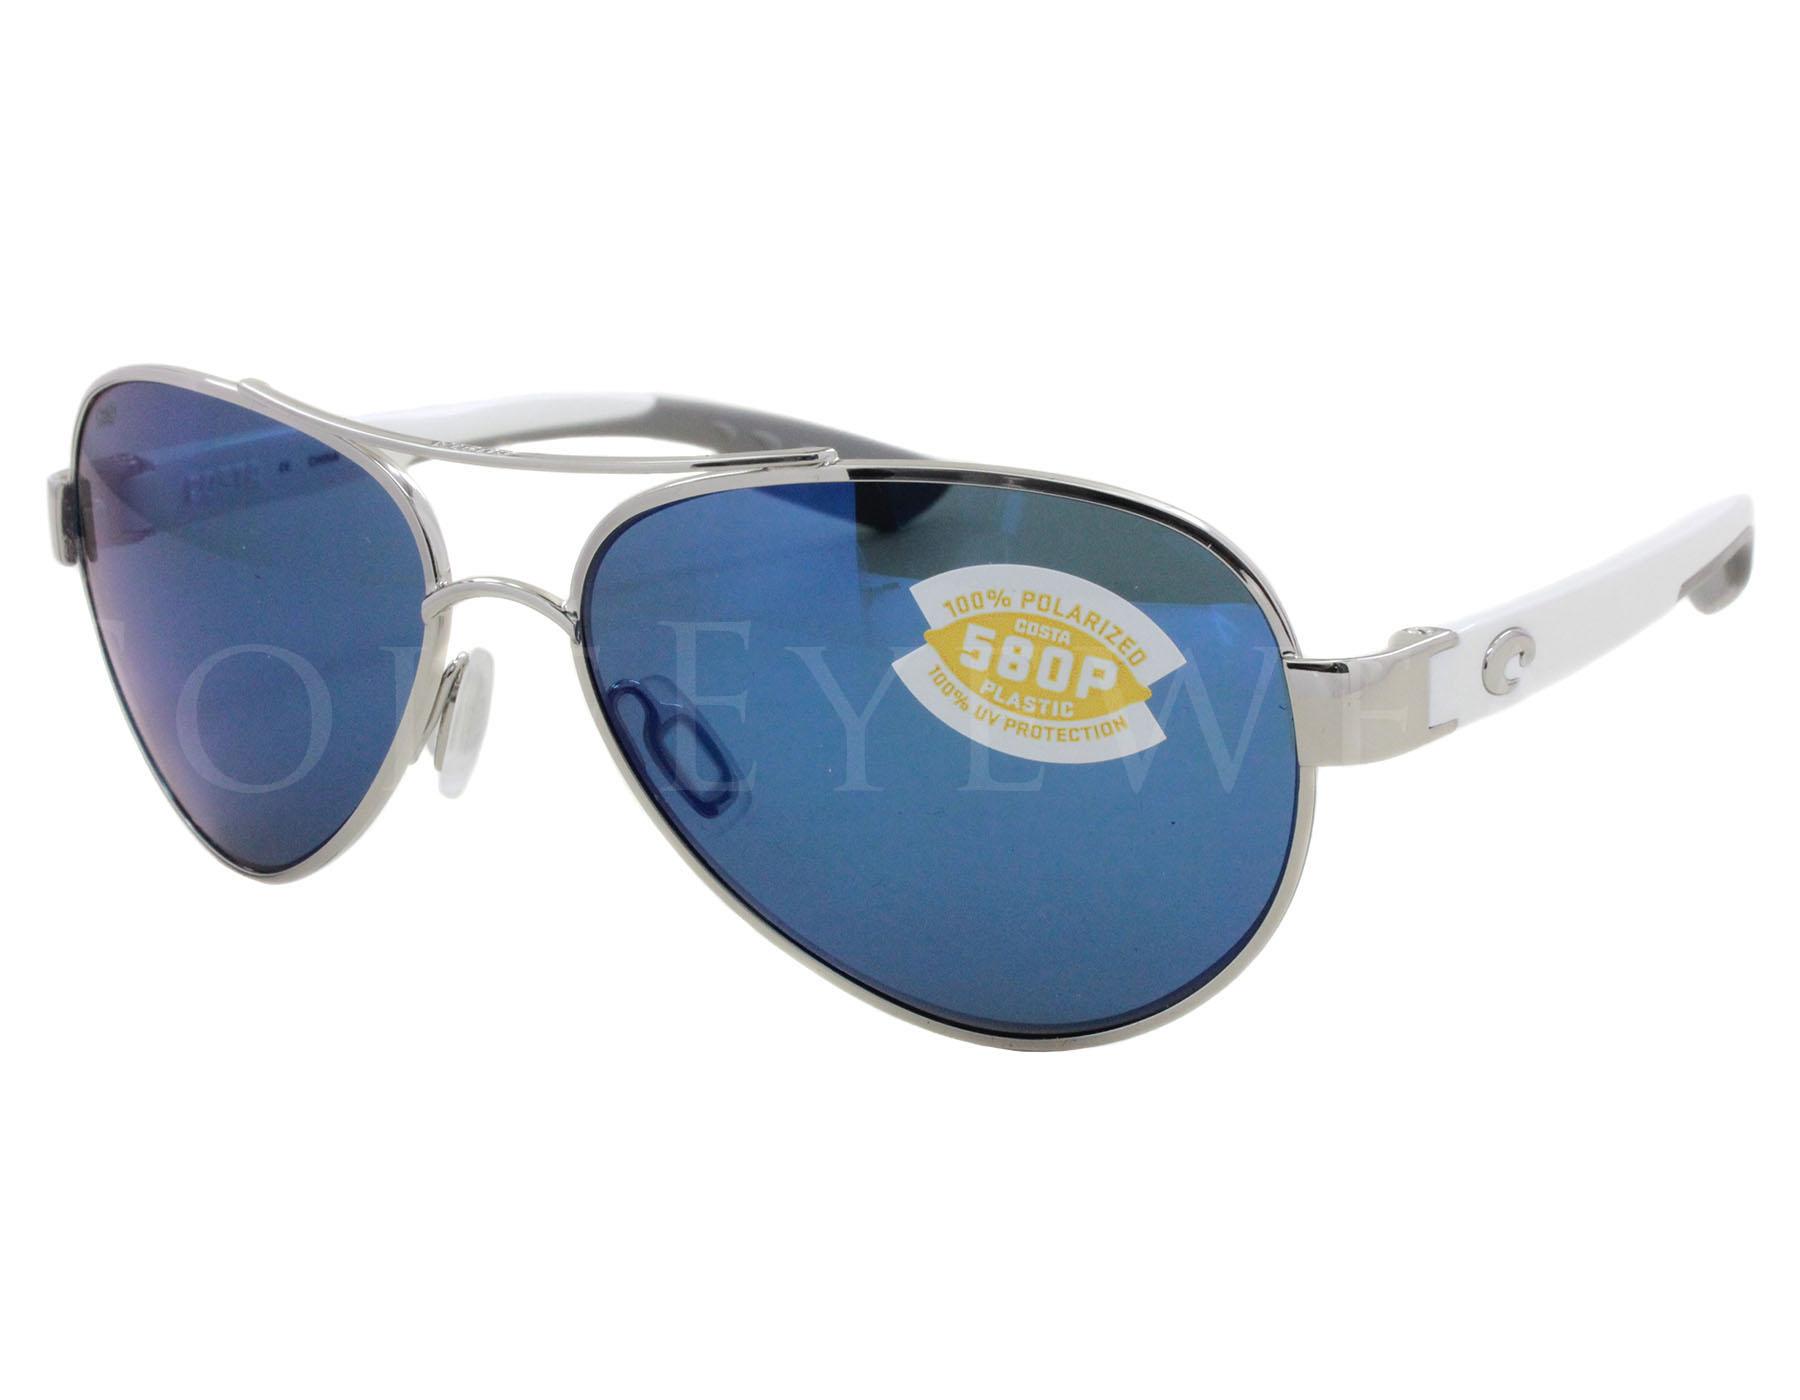 ae78ff4cf0b69 Details about NEW Costa Del Mar Loreto Palladium   Blue LR21 OBMP 580P  Sunglasses